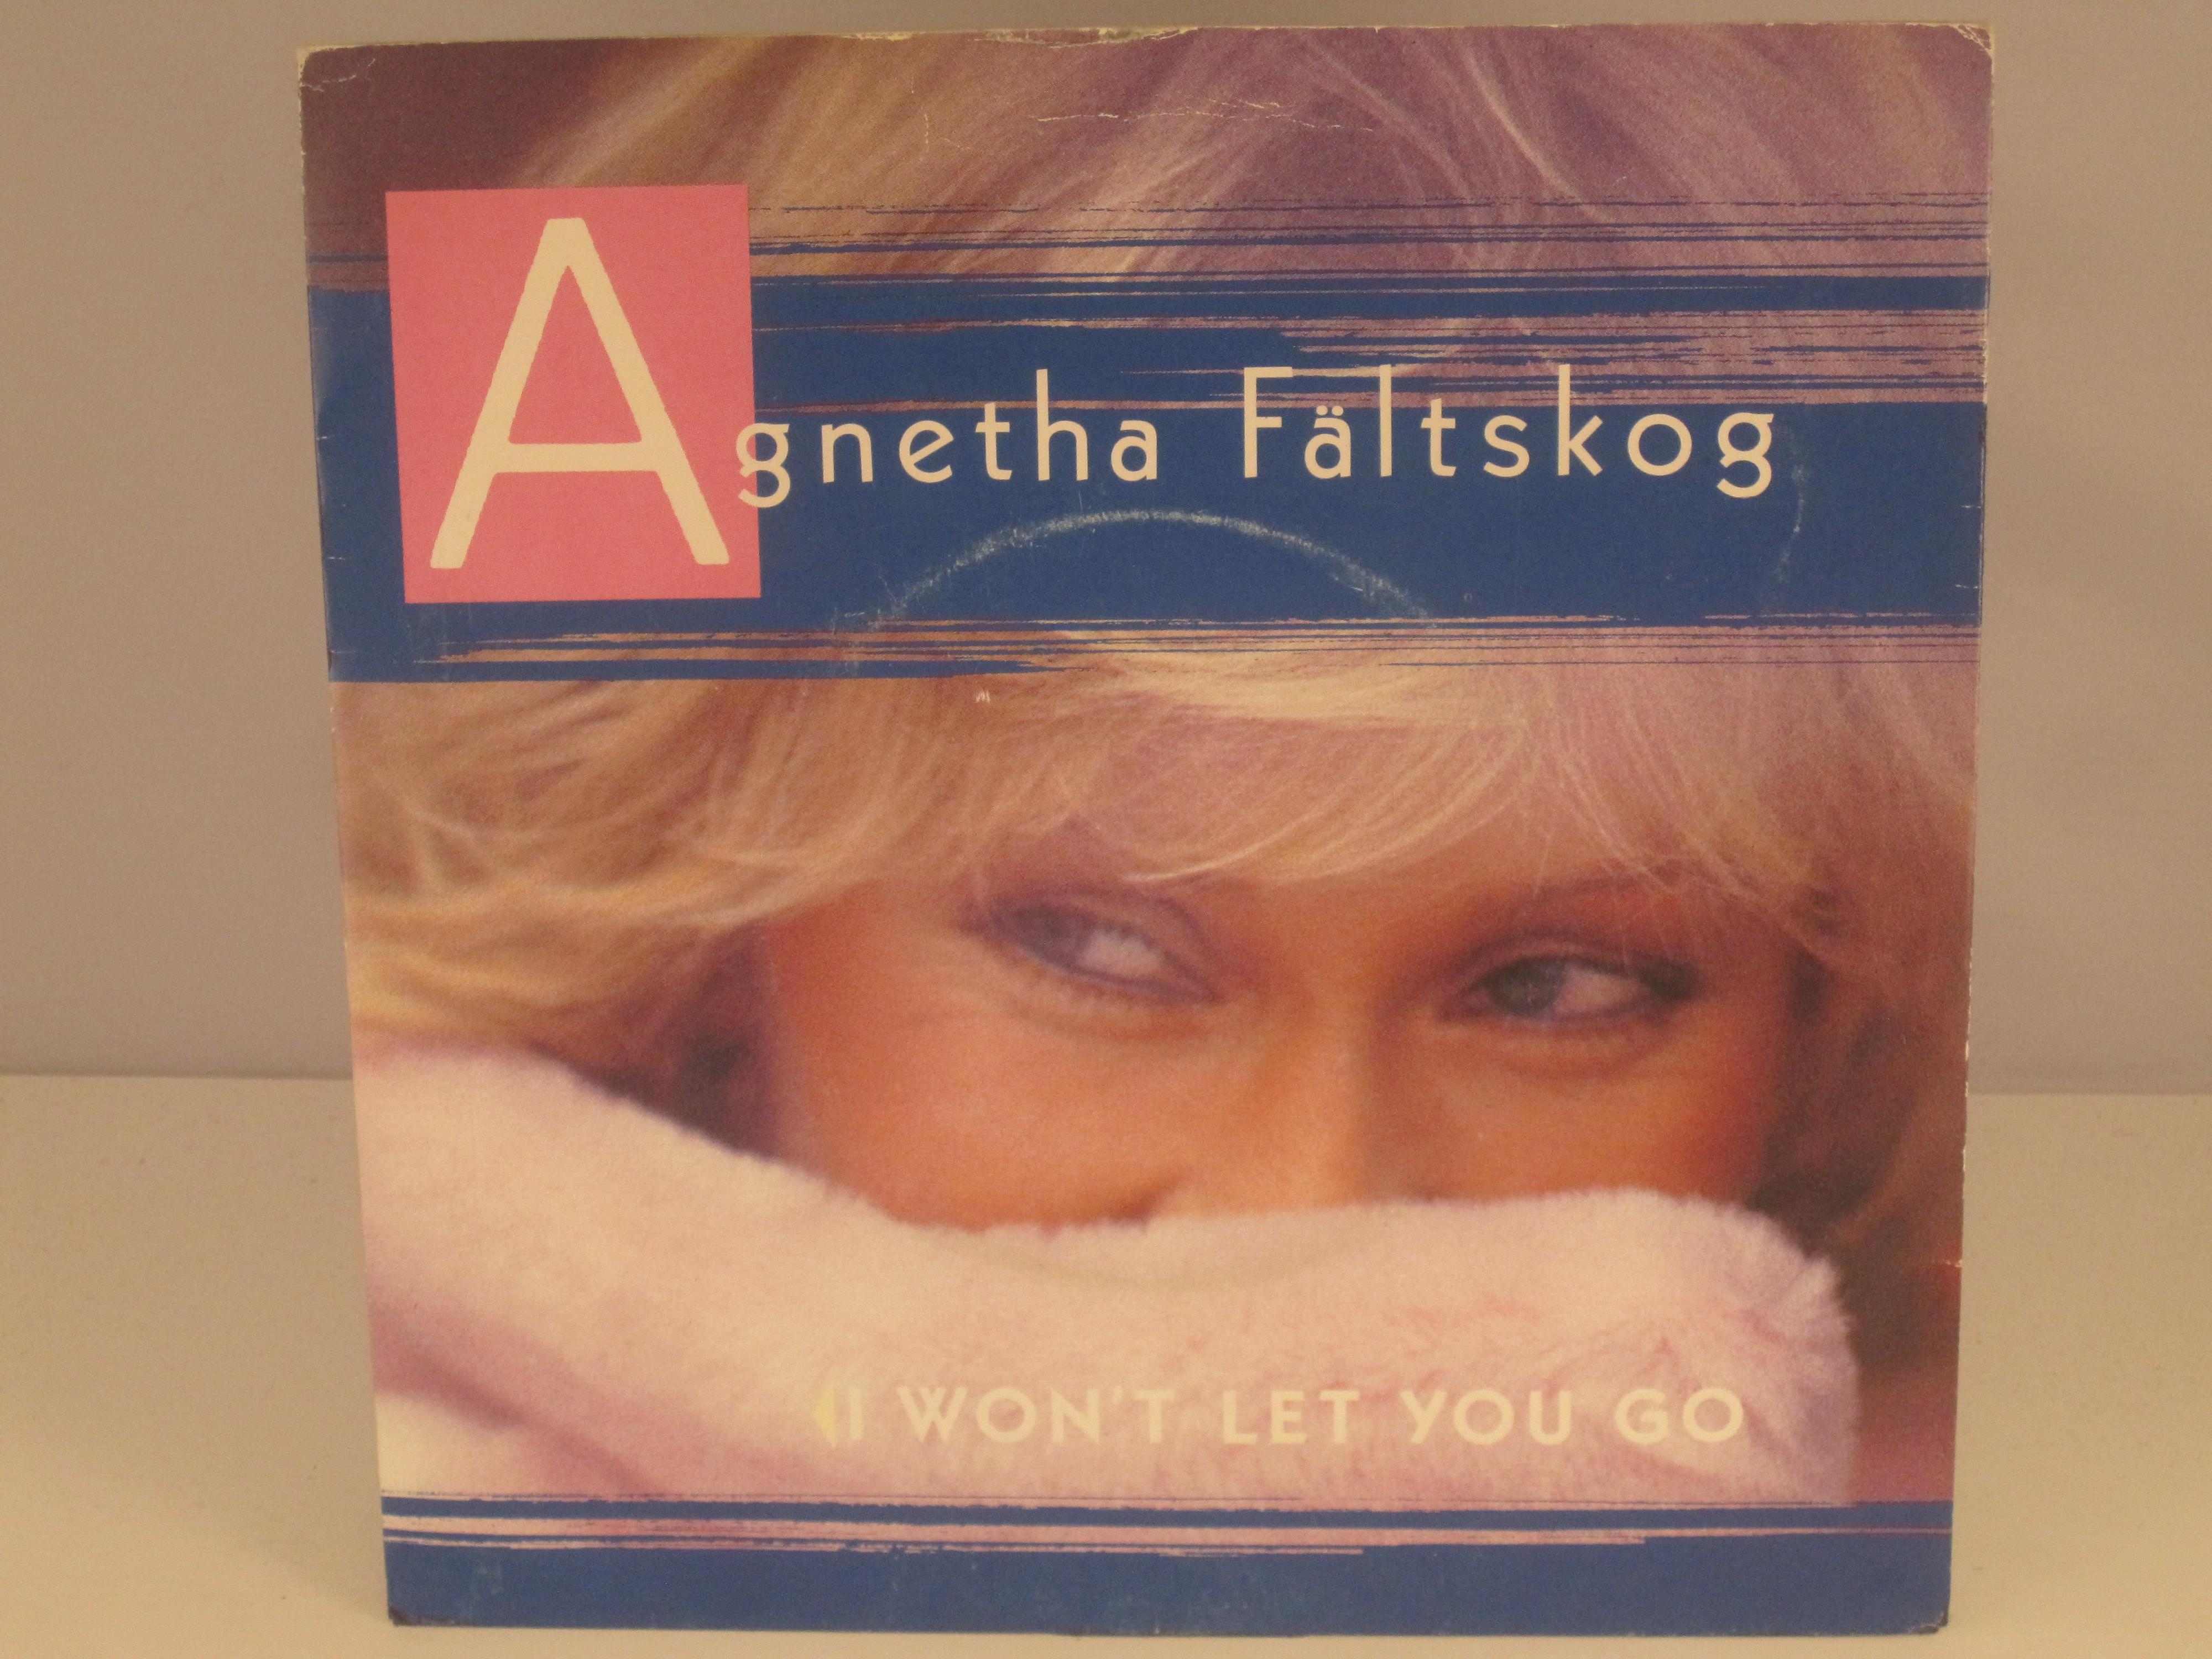 AGNETHA FÄLTSKOG : I won't let you go / You're there